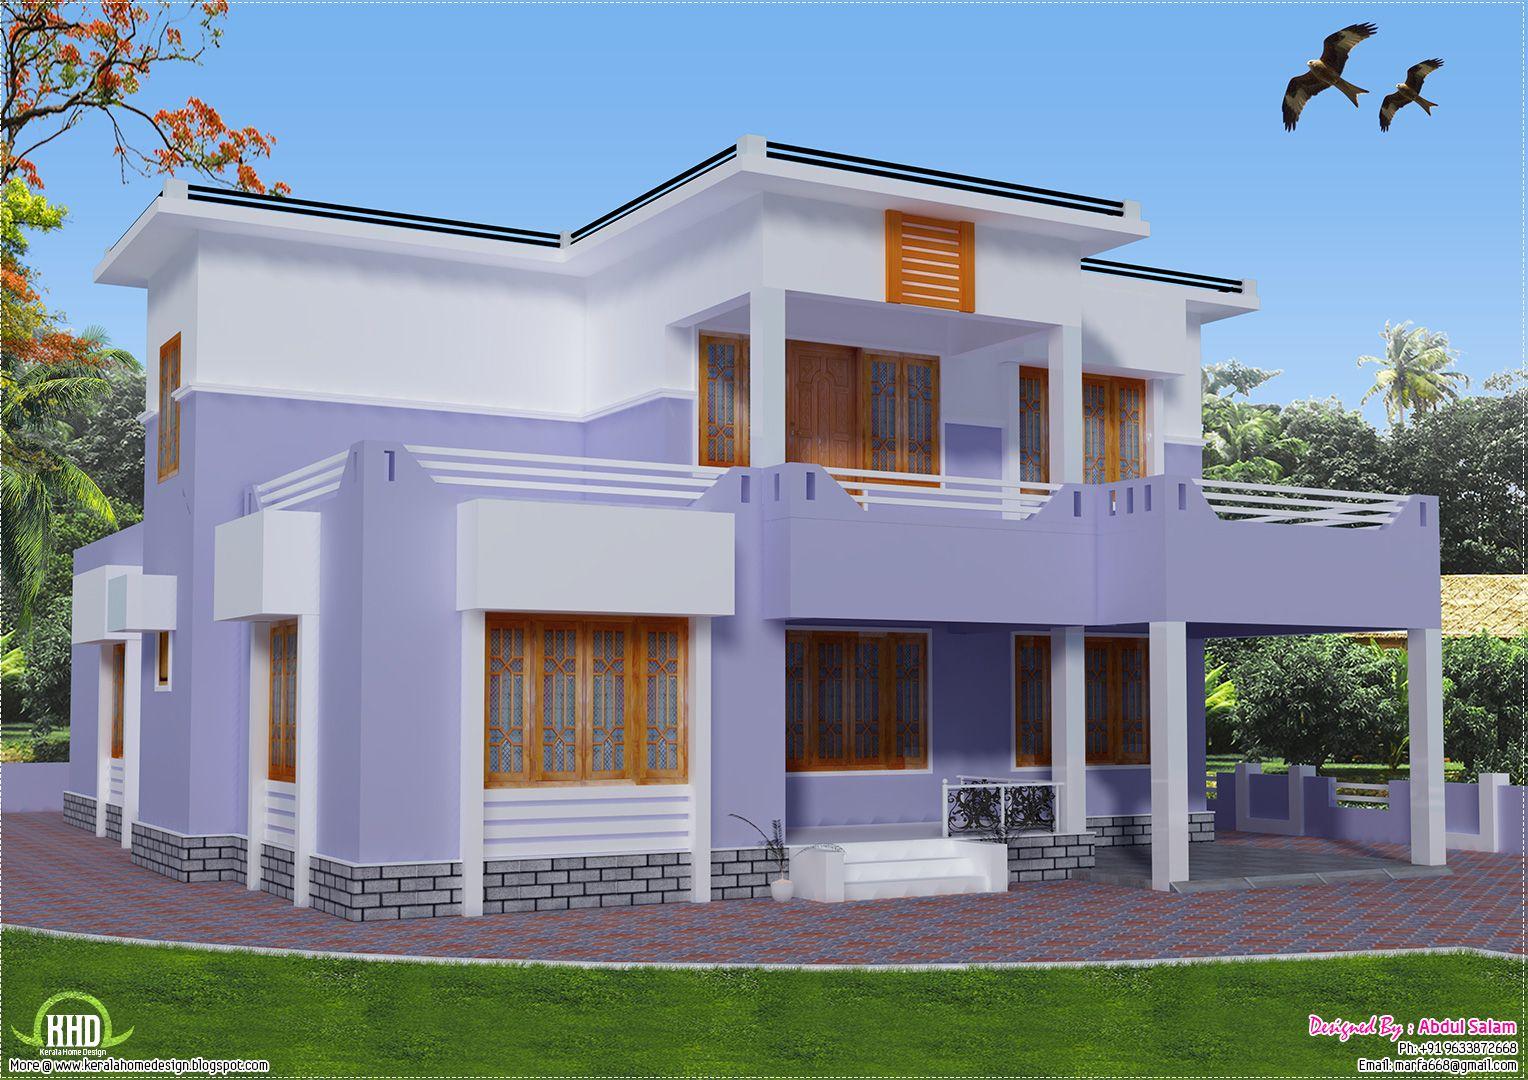 59ff1f2f2a2d16ca3d2a6842aaeb08fd - Get Small Modern House Roof Design Pics